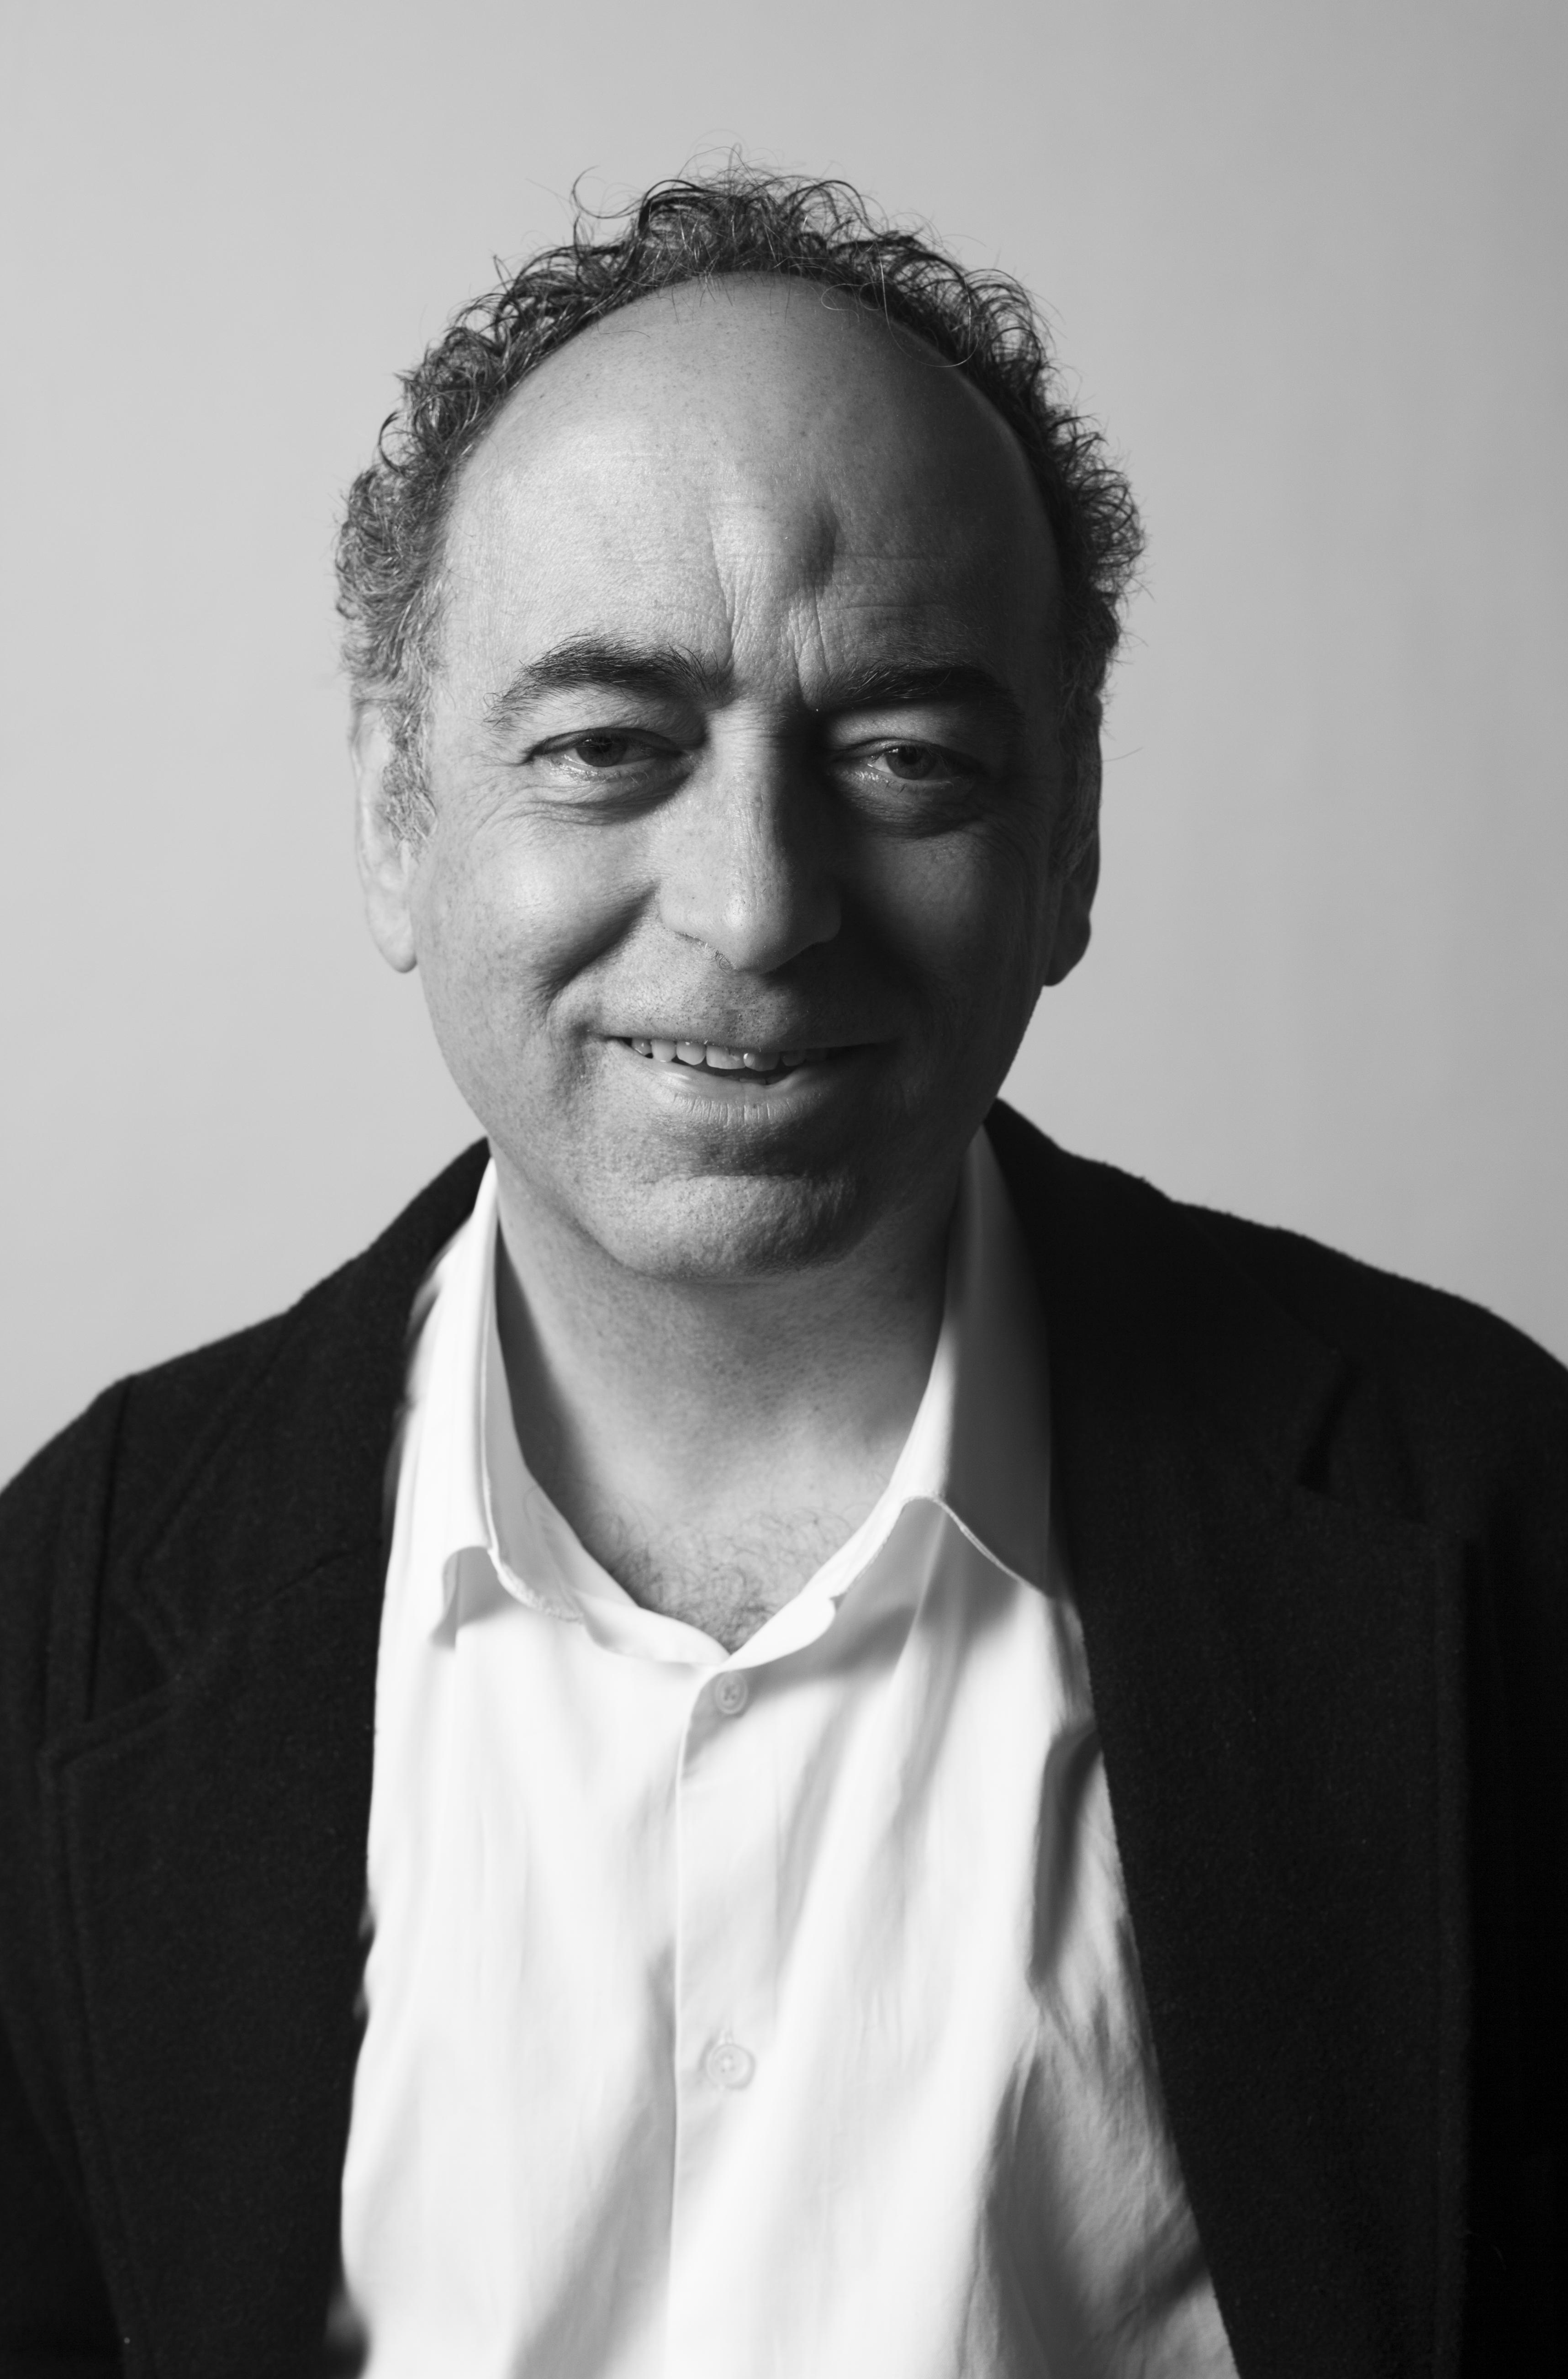 Pascal Vacher